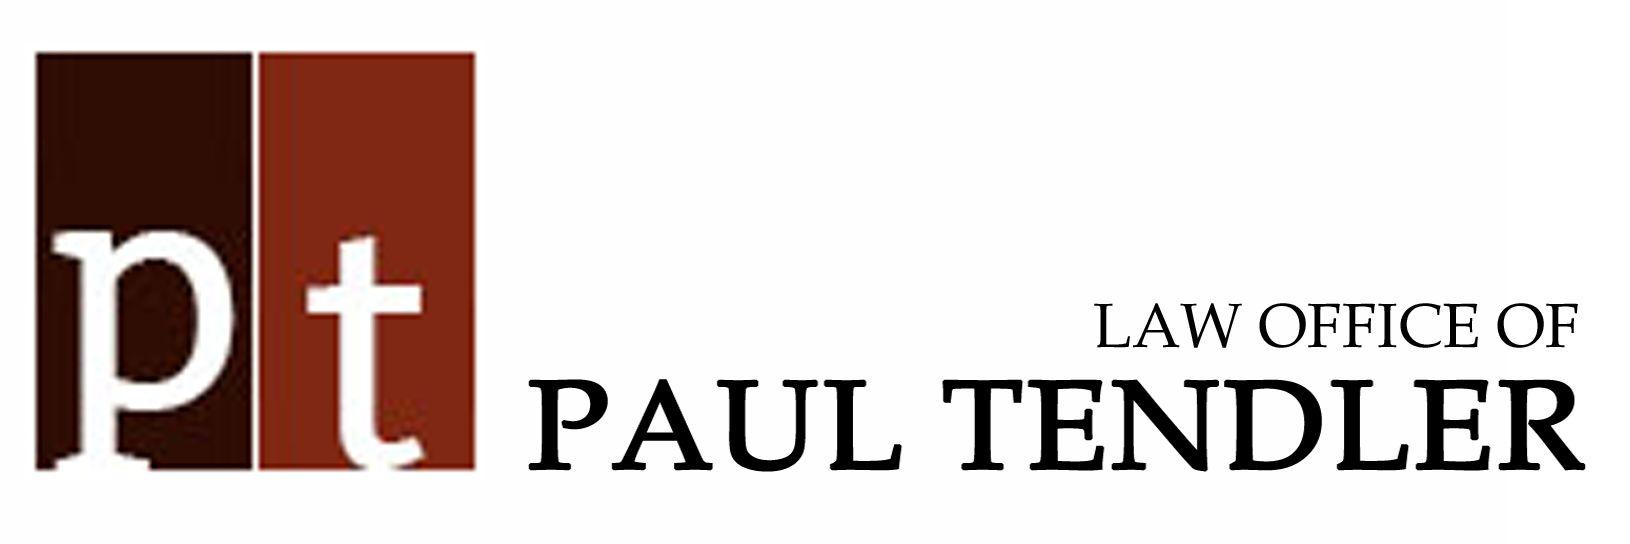 Law Office of Paul Tendler